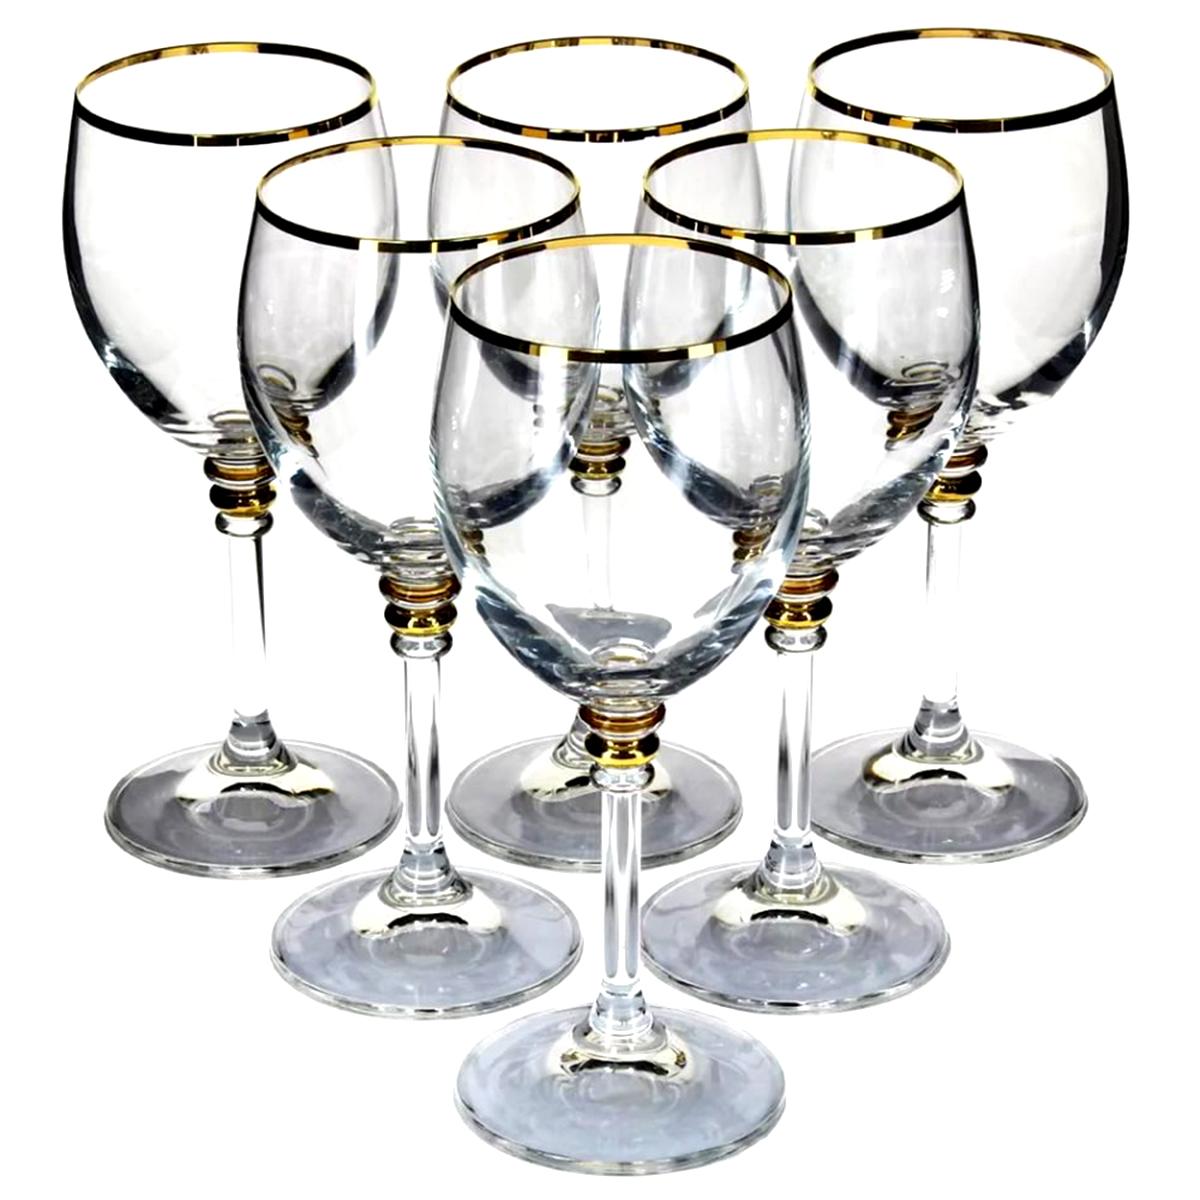 Набор бокалов для вина Bohemia Crystal Оливия, 240 мл, 6 шт набор бокалов для шампанского bohemia crystal оливия 190 мл 6 шт